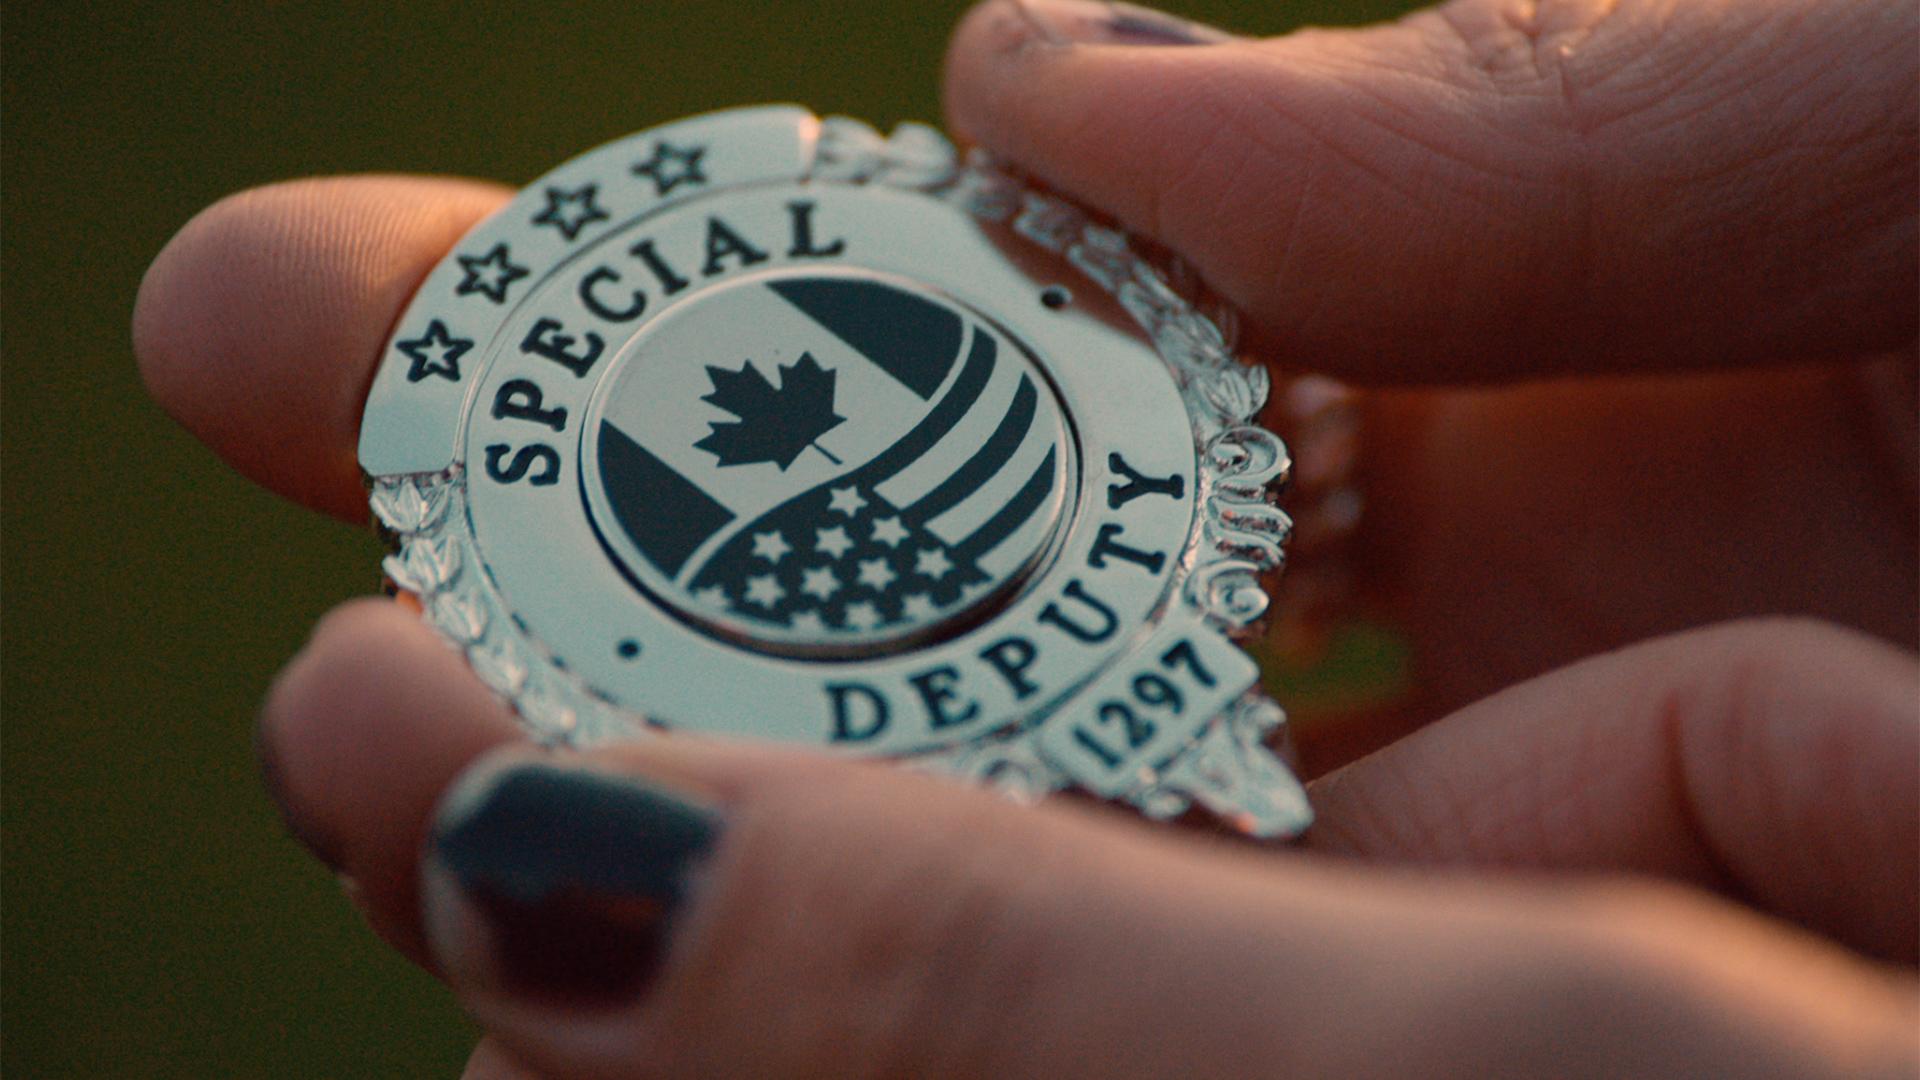 Special Deputy